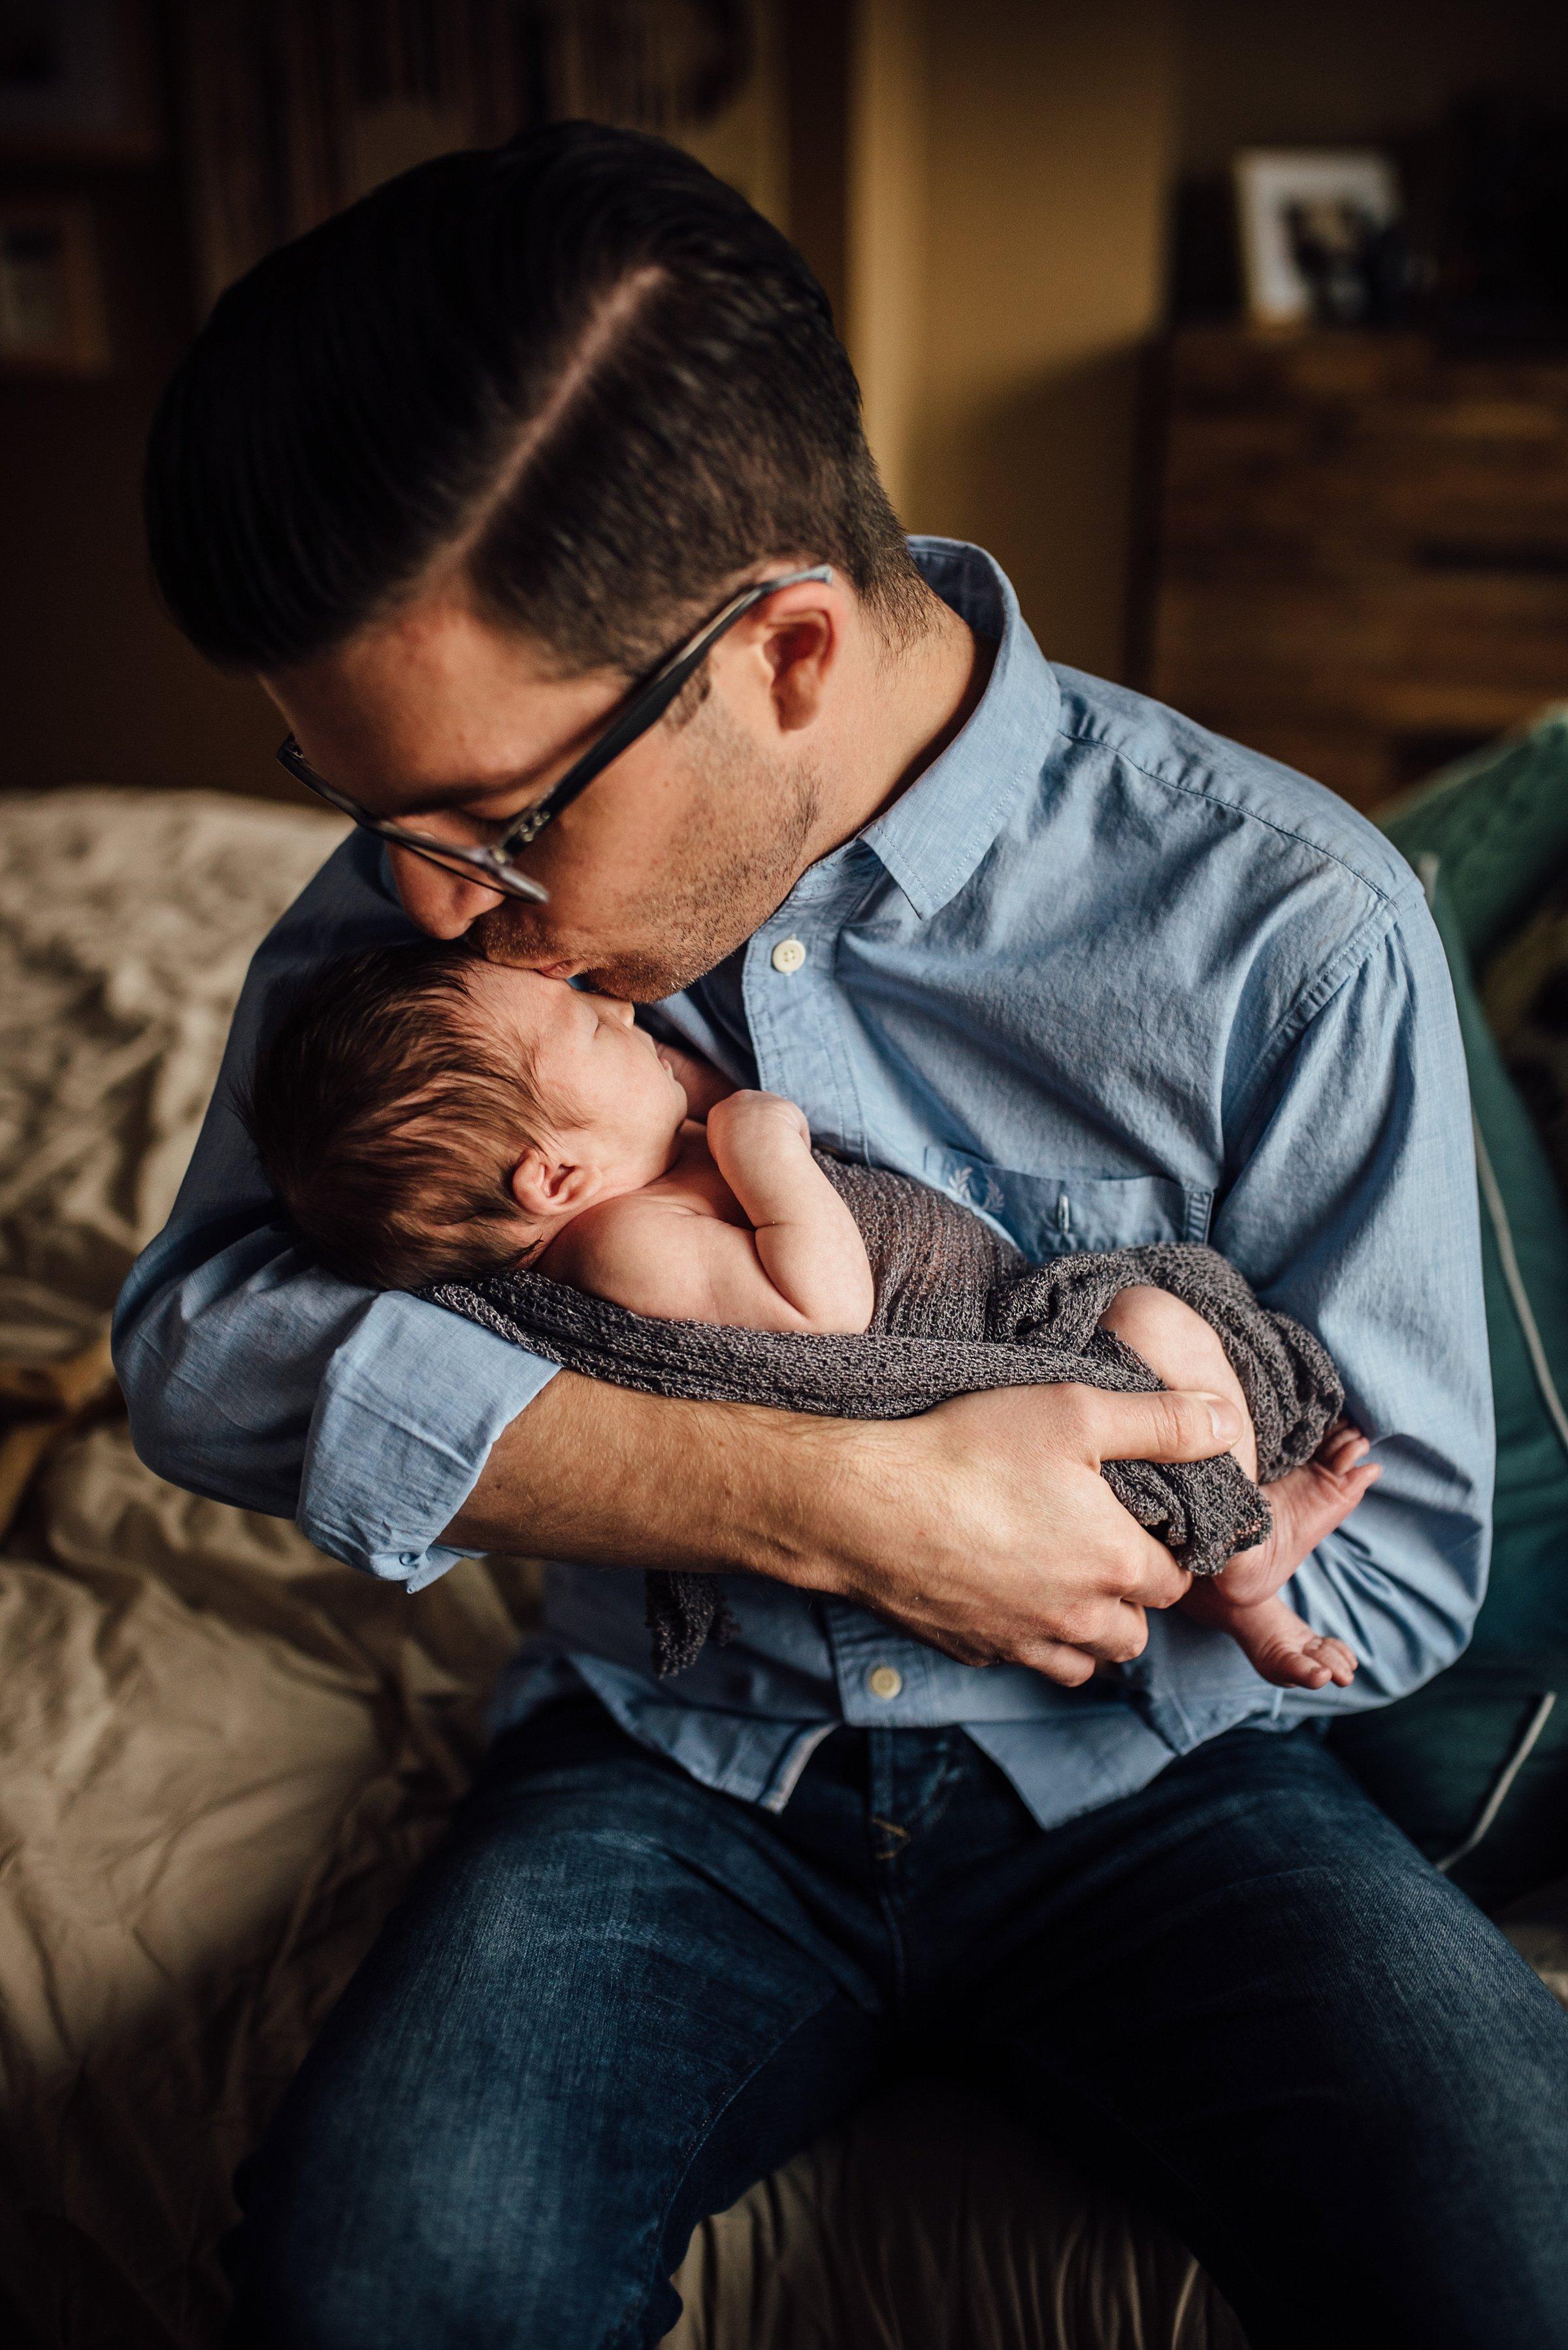 Newborn-Photographer-Lifestyle-Photography-Pittsburgh-Rachel-Rossetti-Fatherhood